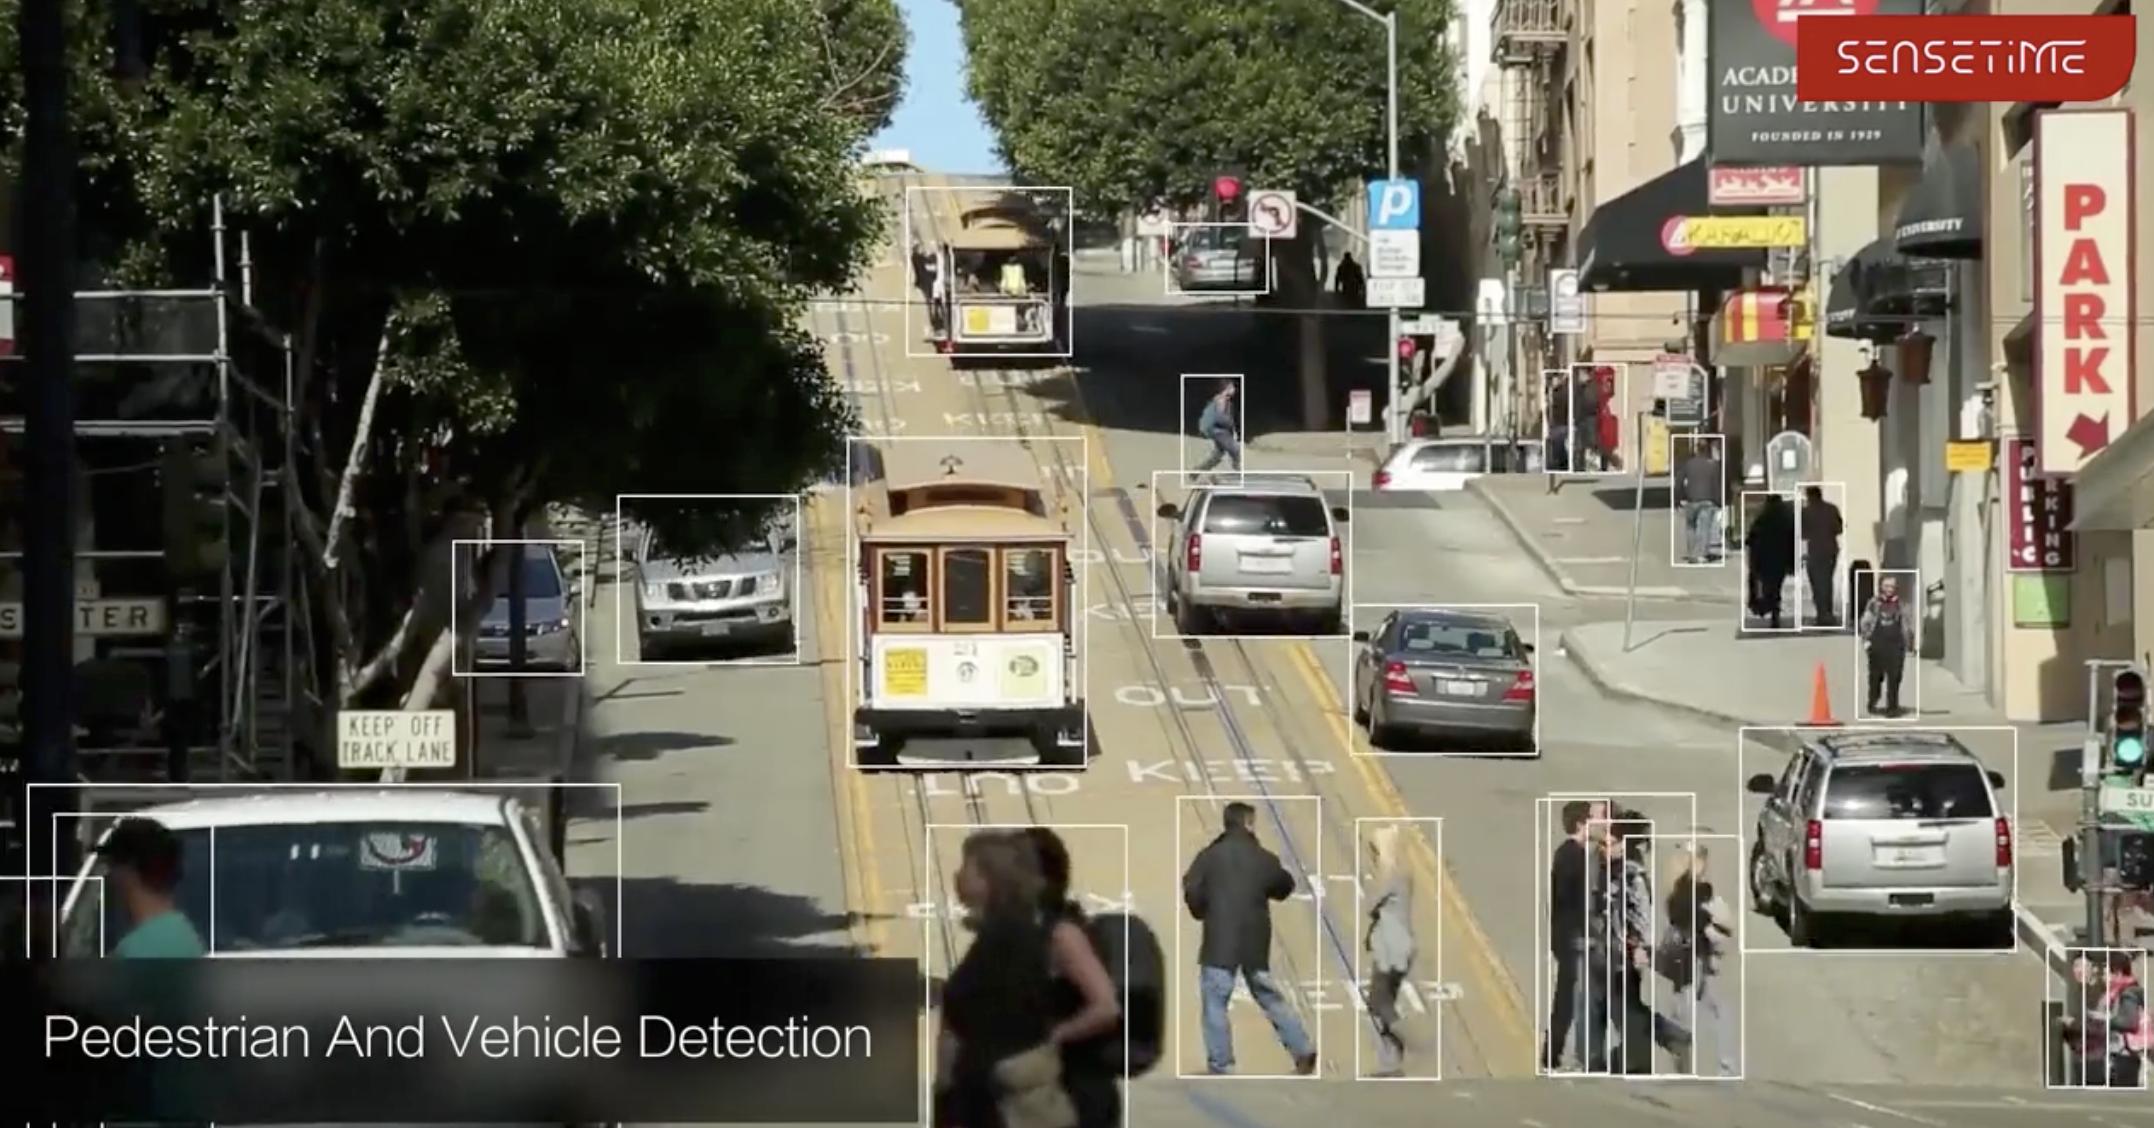 Uberの自動運転車プロジェクトの現状 ~カリフォルニア州でのテスト走行中止~